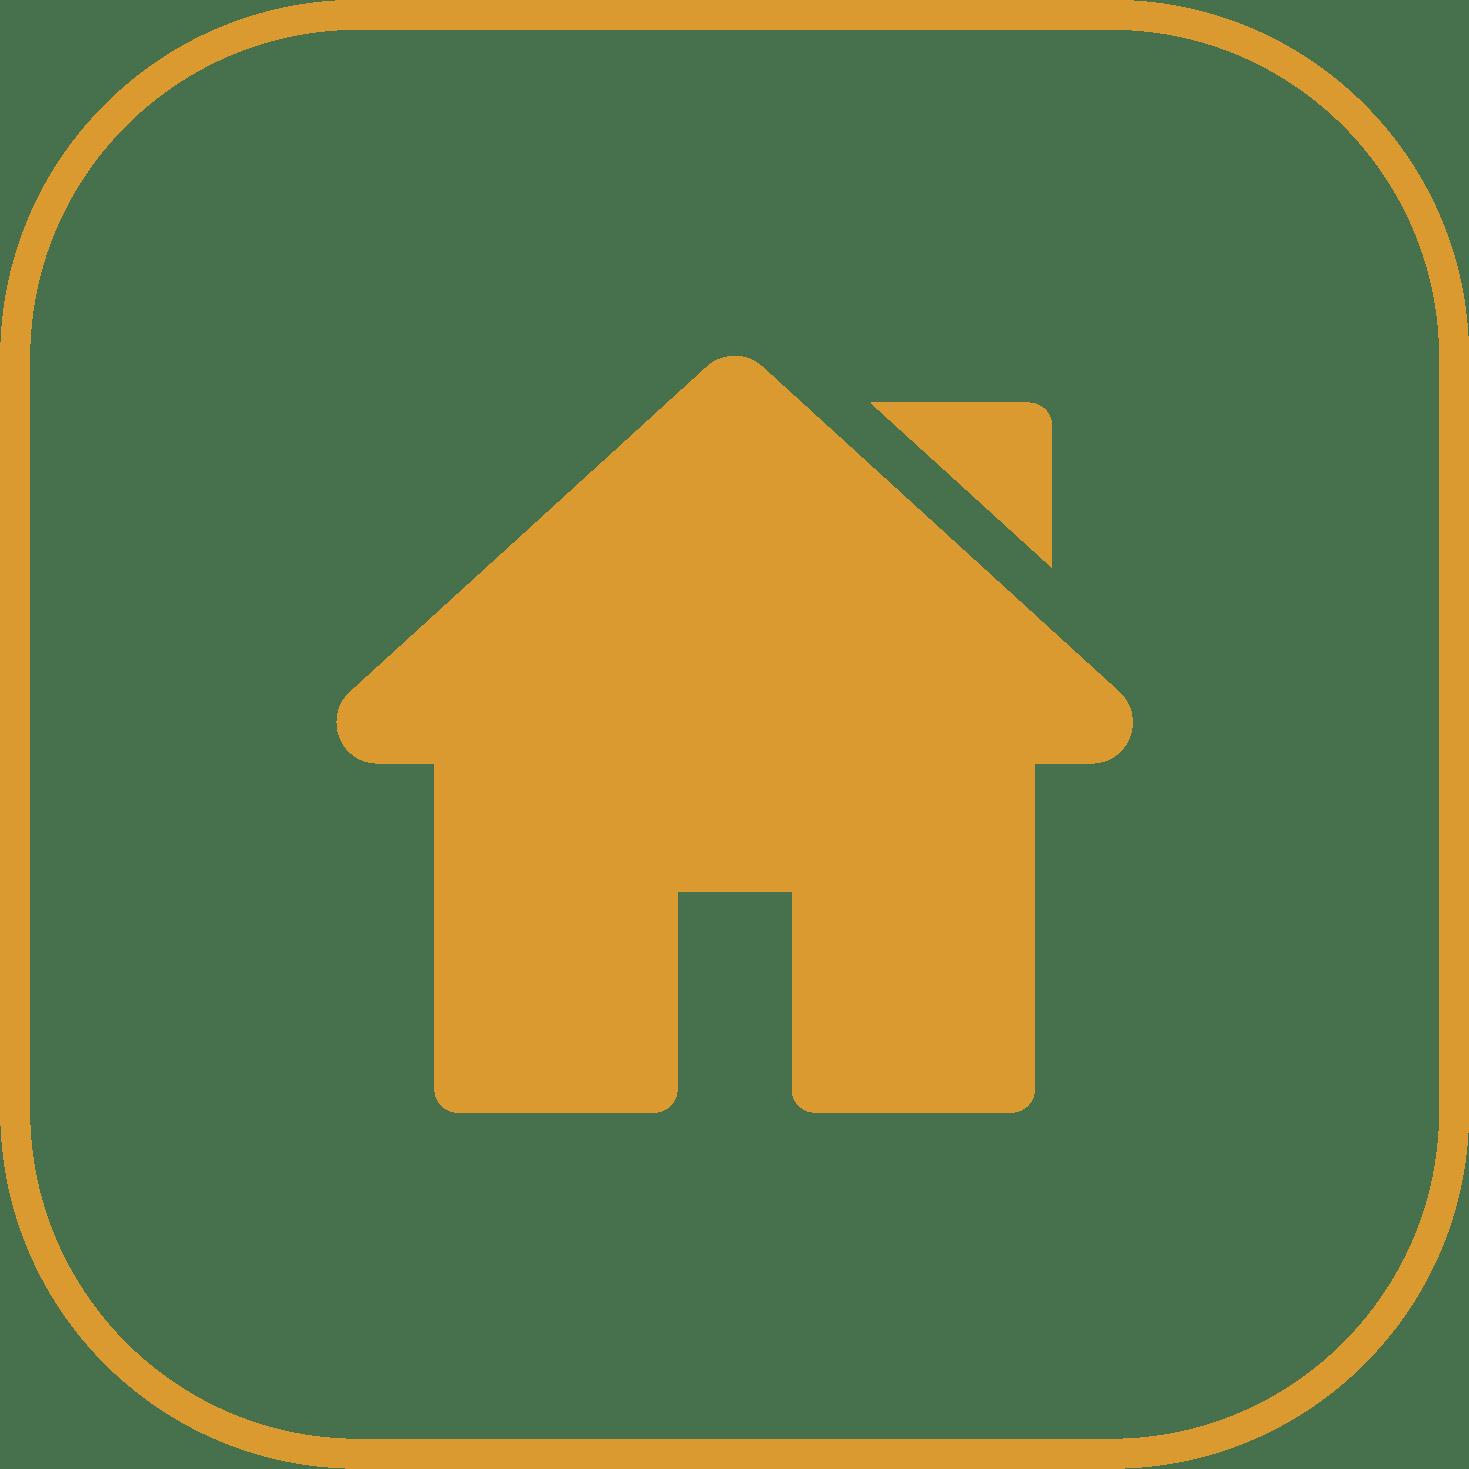 Pesona Remboelan Serpong - Rumah 2 Lantai Cukup DP 34 Juta Langsung Akad 5